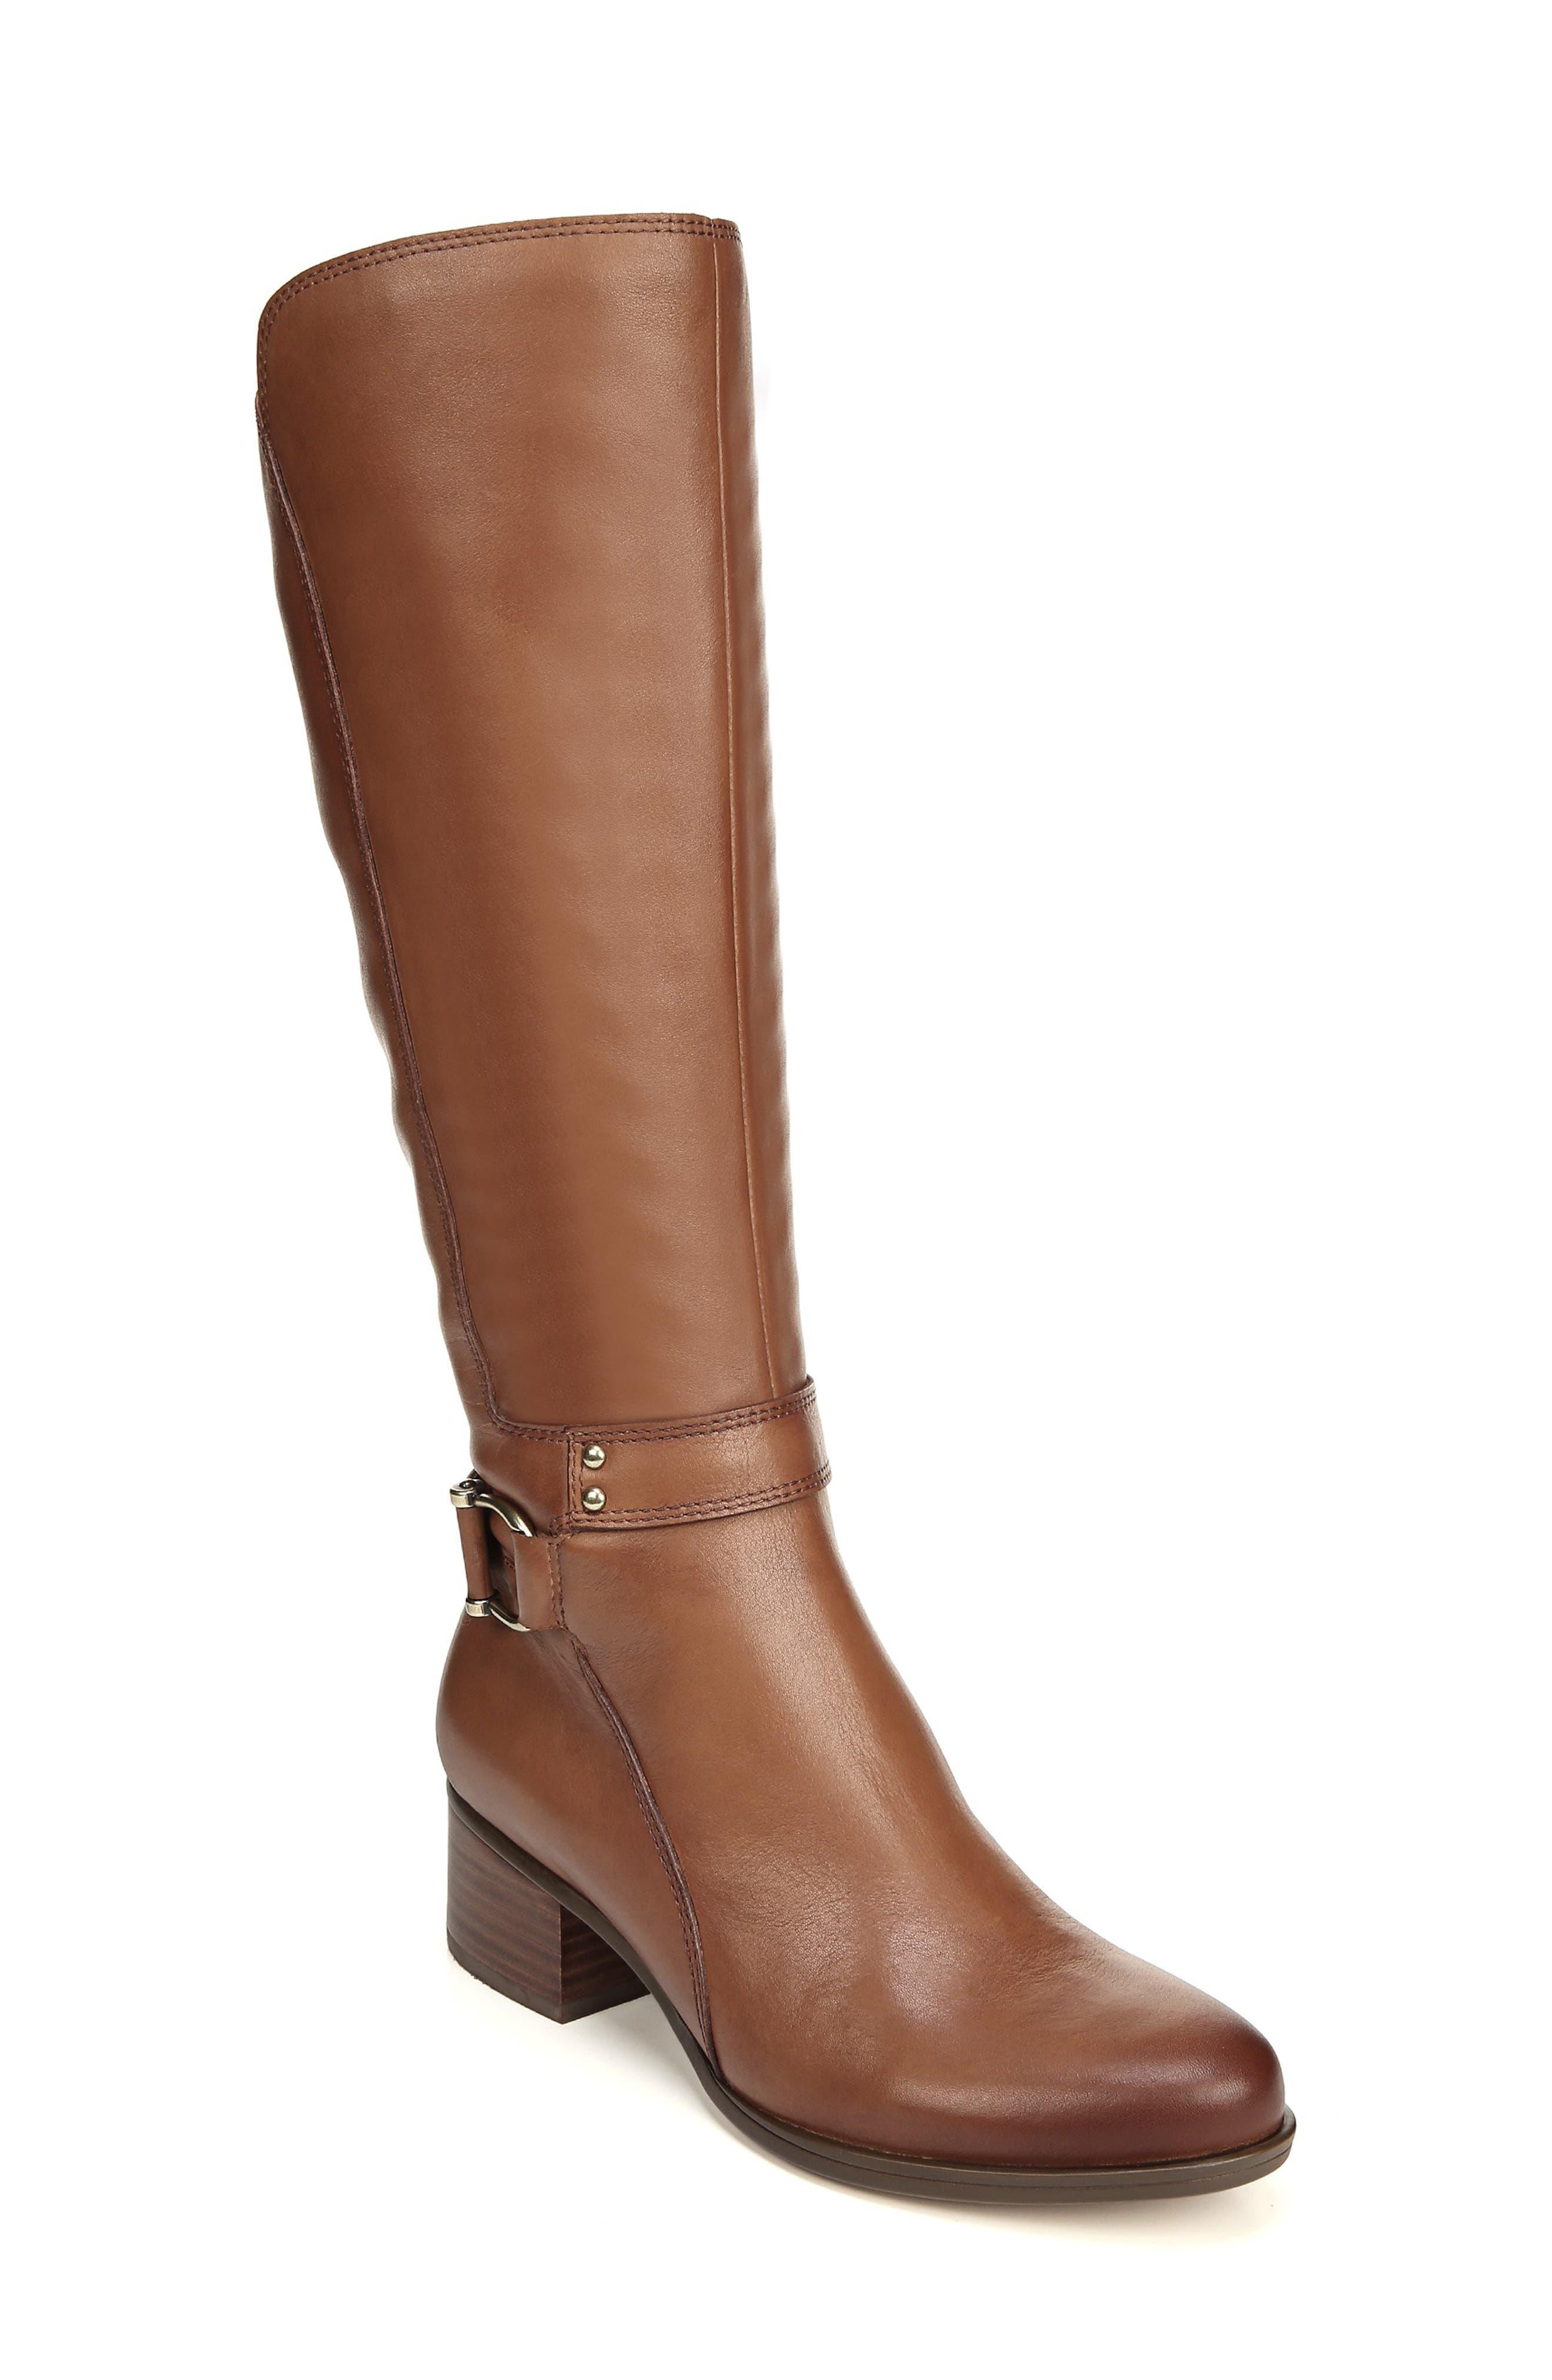 Naturalizer Dane Knee High Riding Boot Regular Calf- Brown